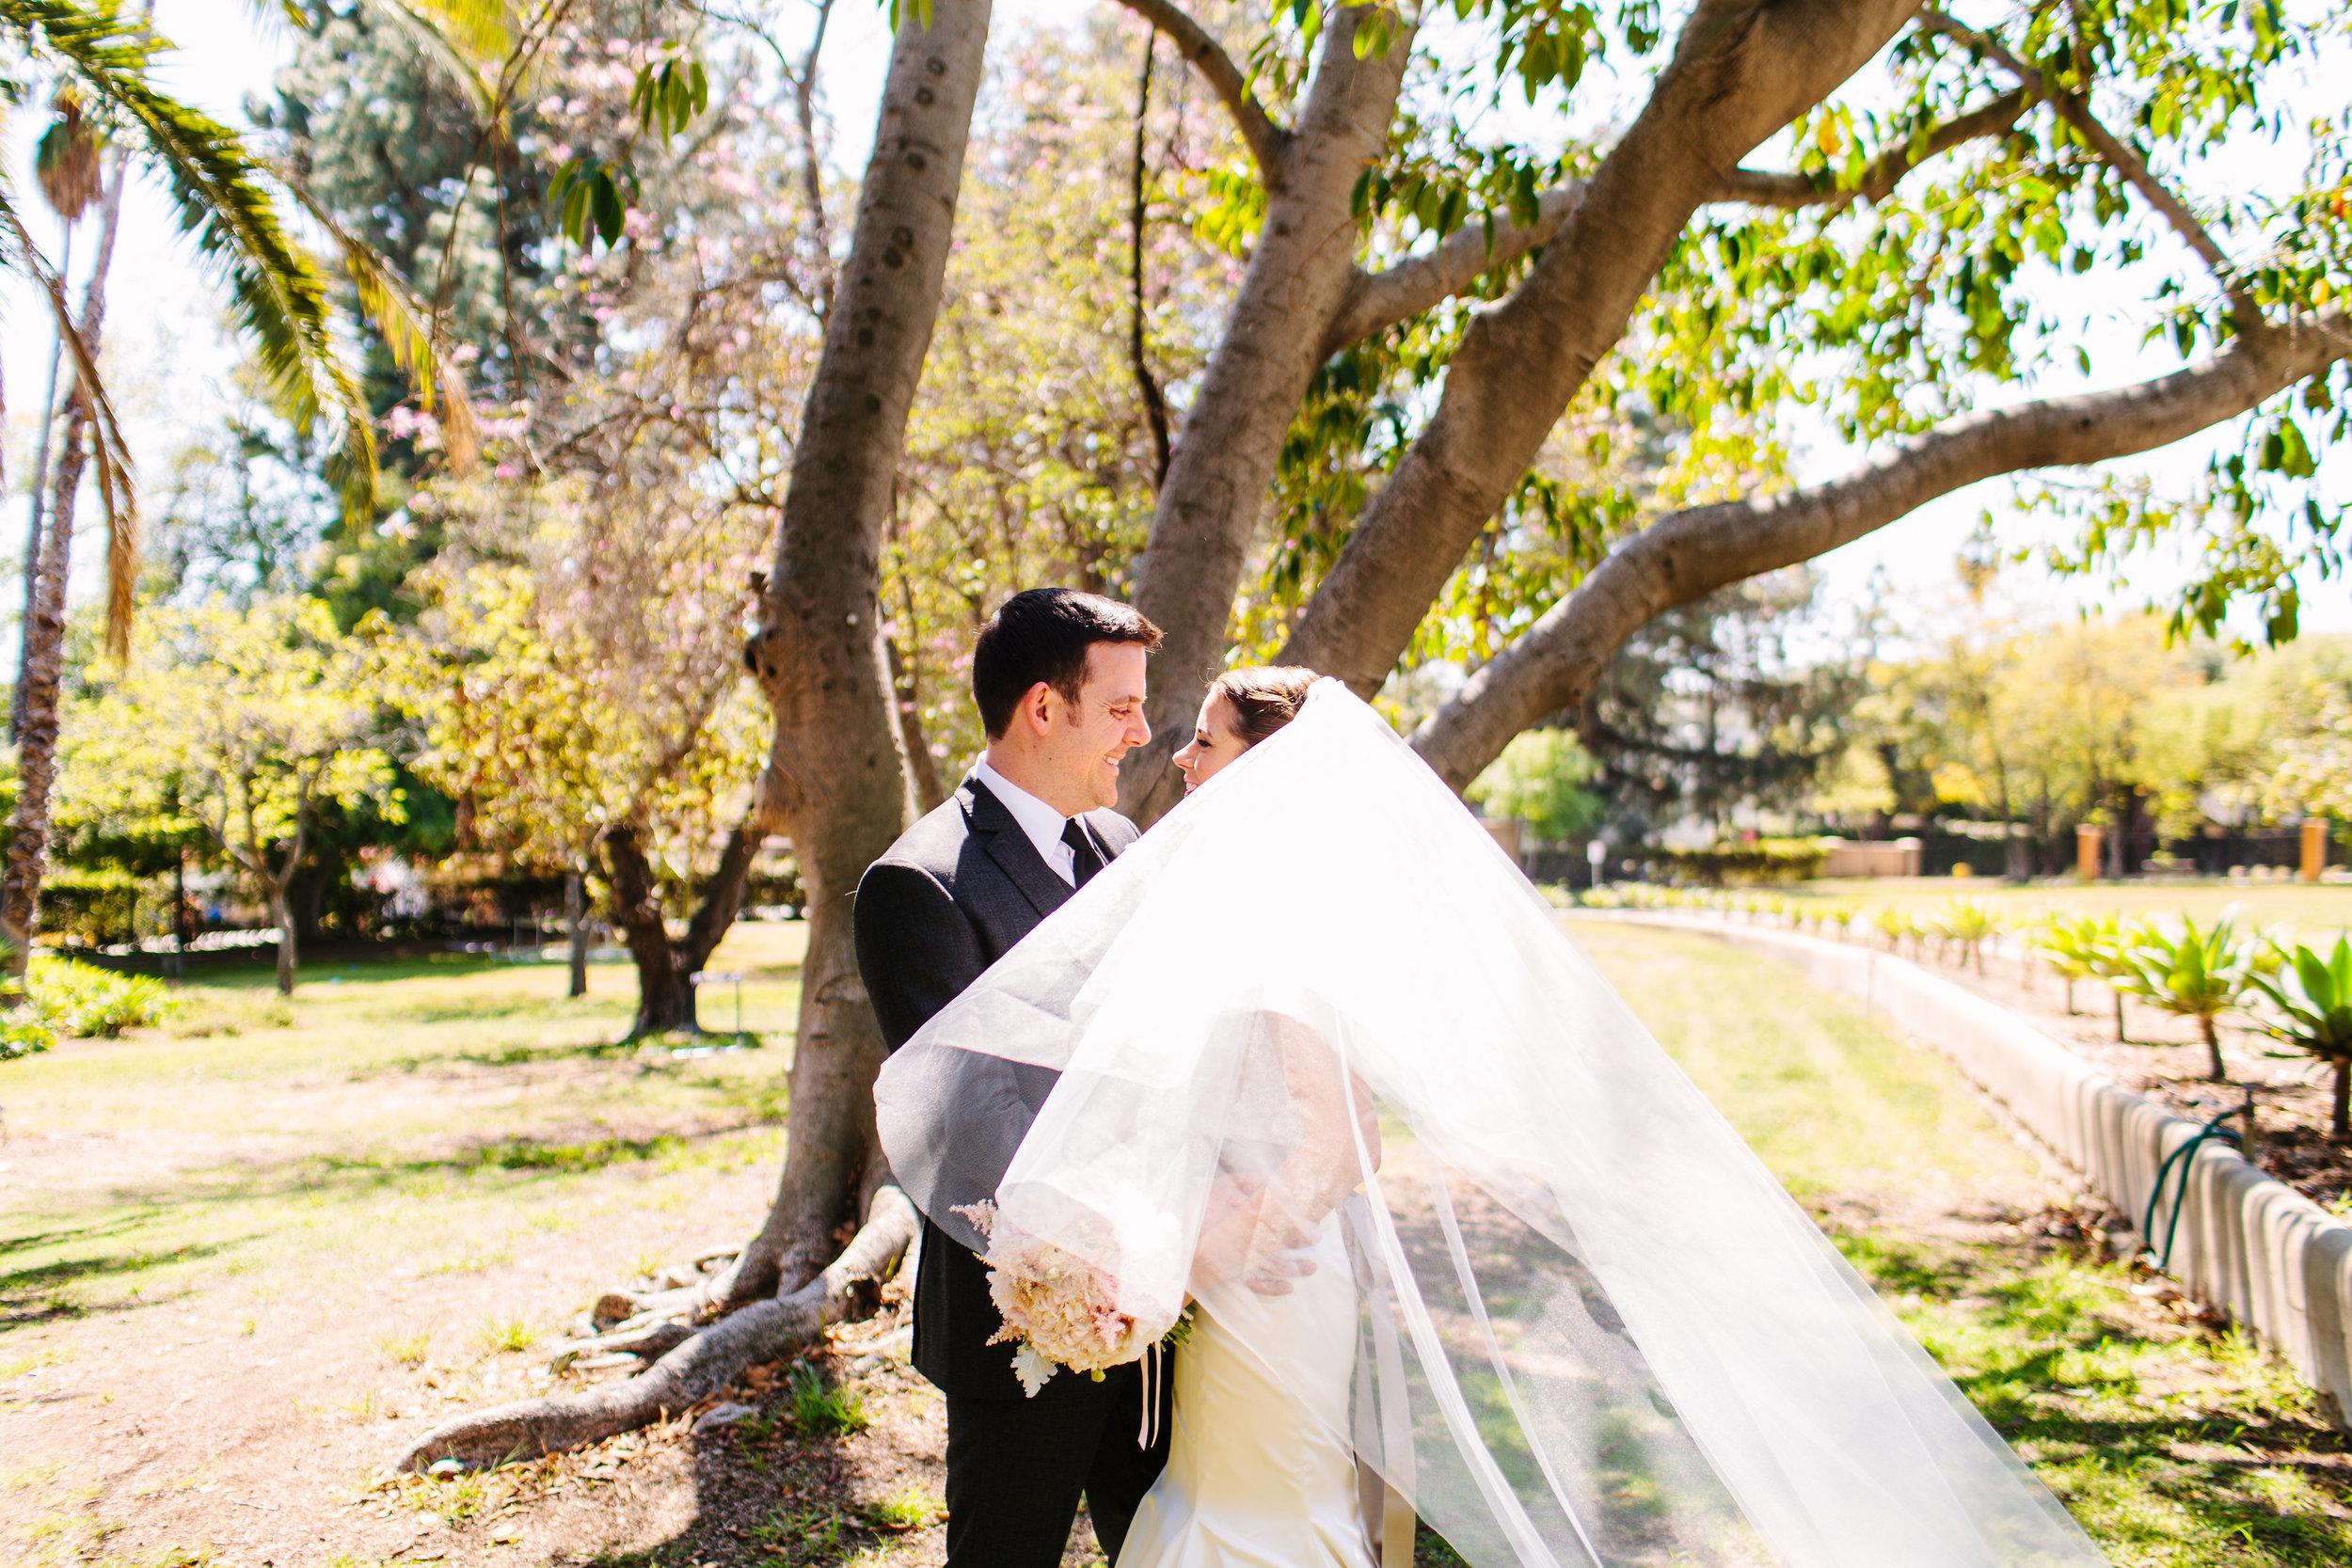 Vinny&MackenzieVillaDelSolD'OroWeddingPhotos-LosAngelesWeddingPhotographerLauraPedrino-20.jpg